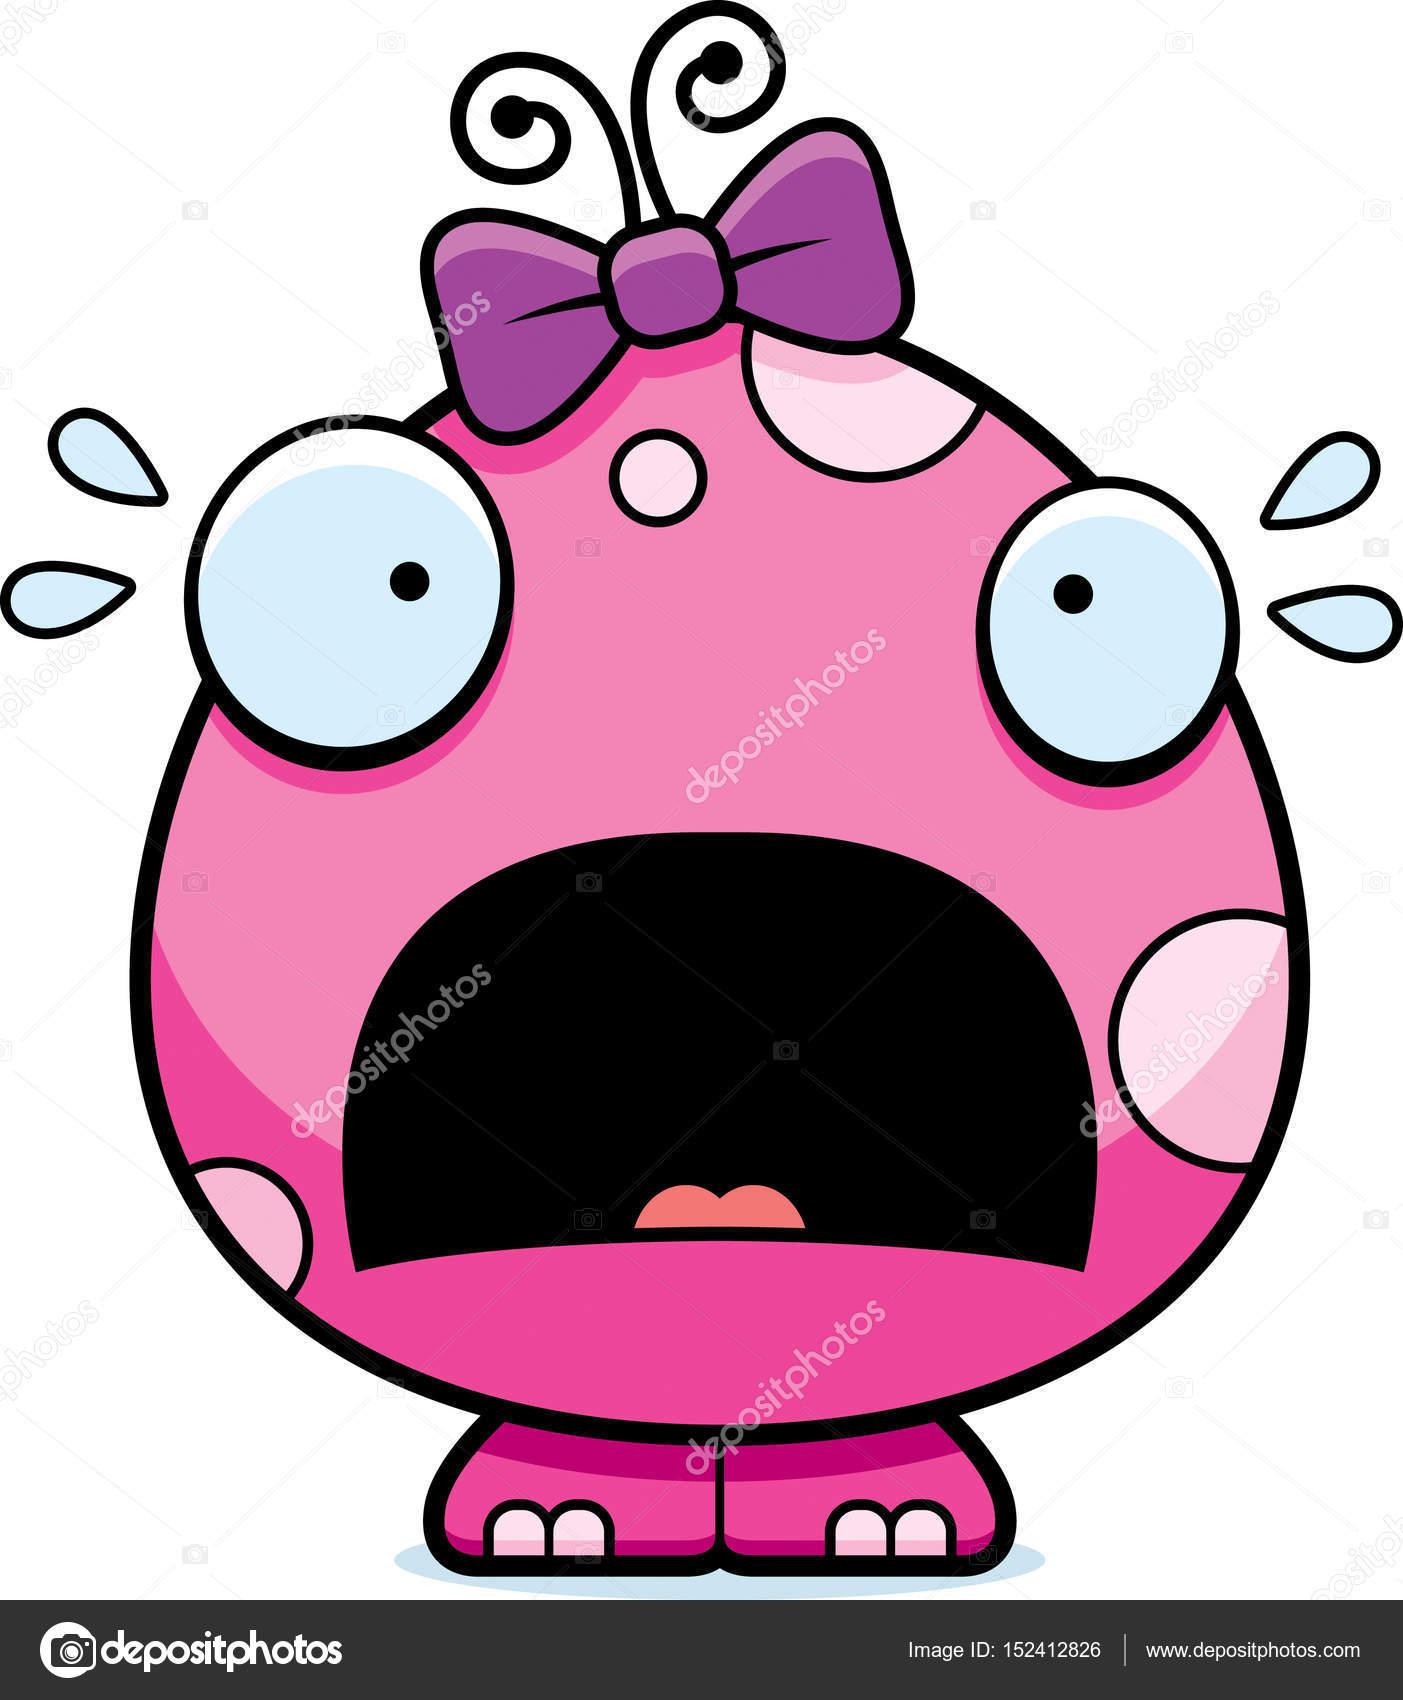 1403x1700 Scared Cartoon Baby Girl Monster Stock Vector Cthoman